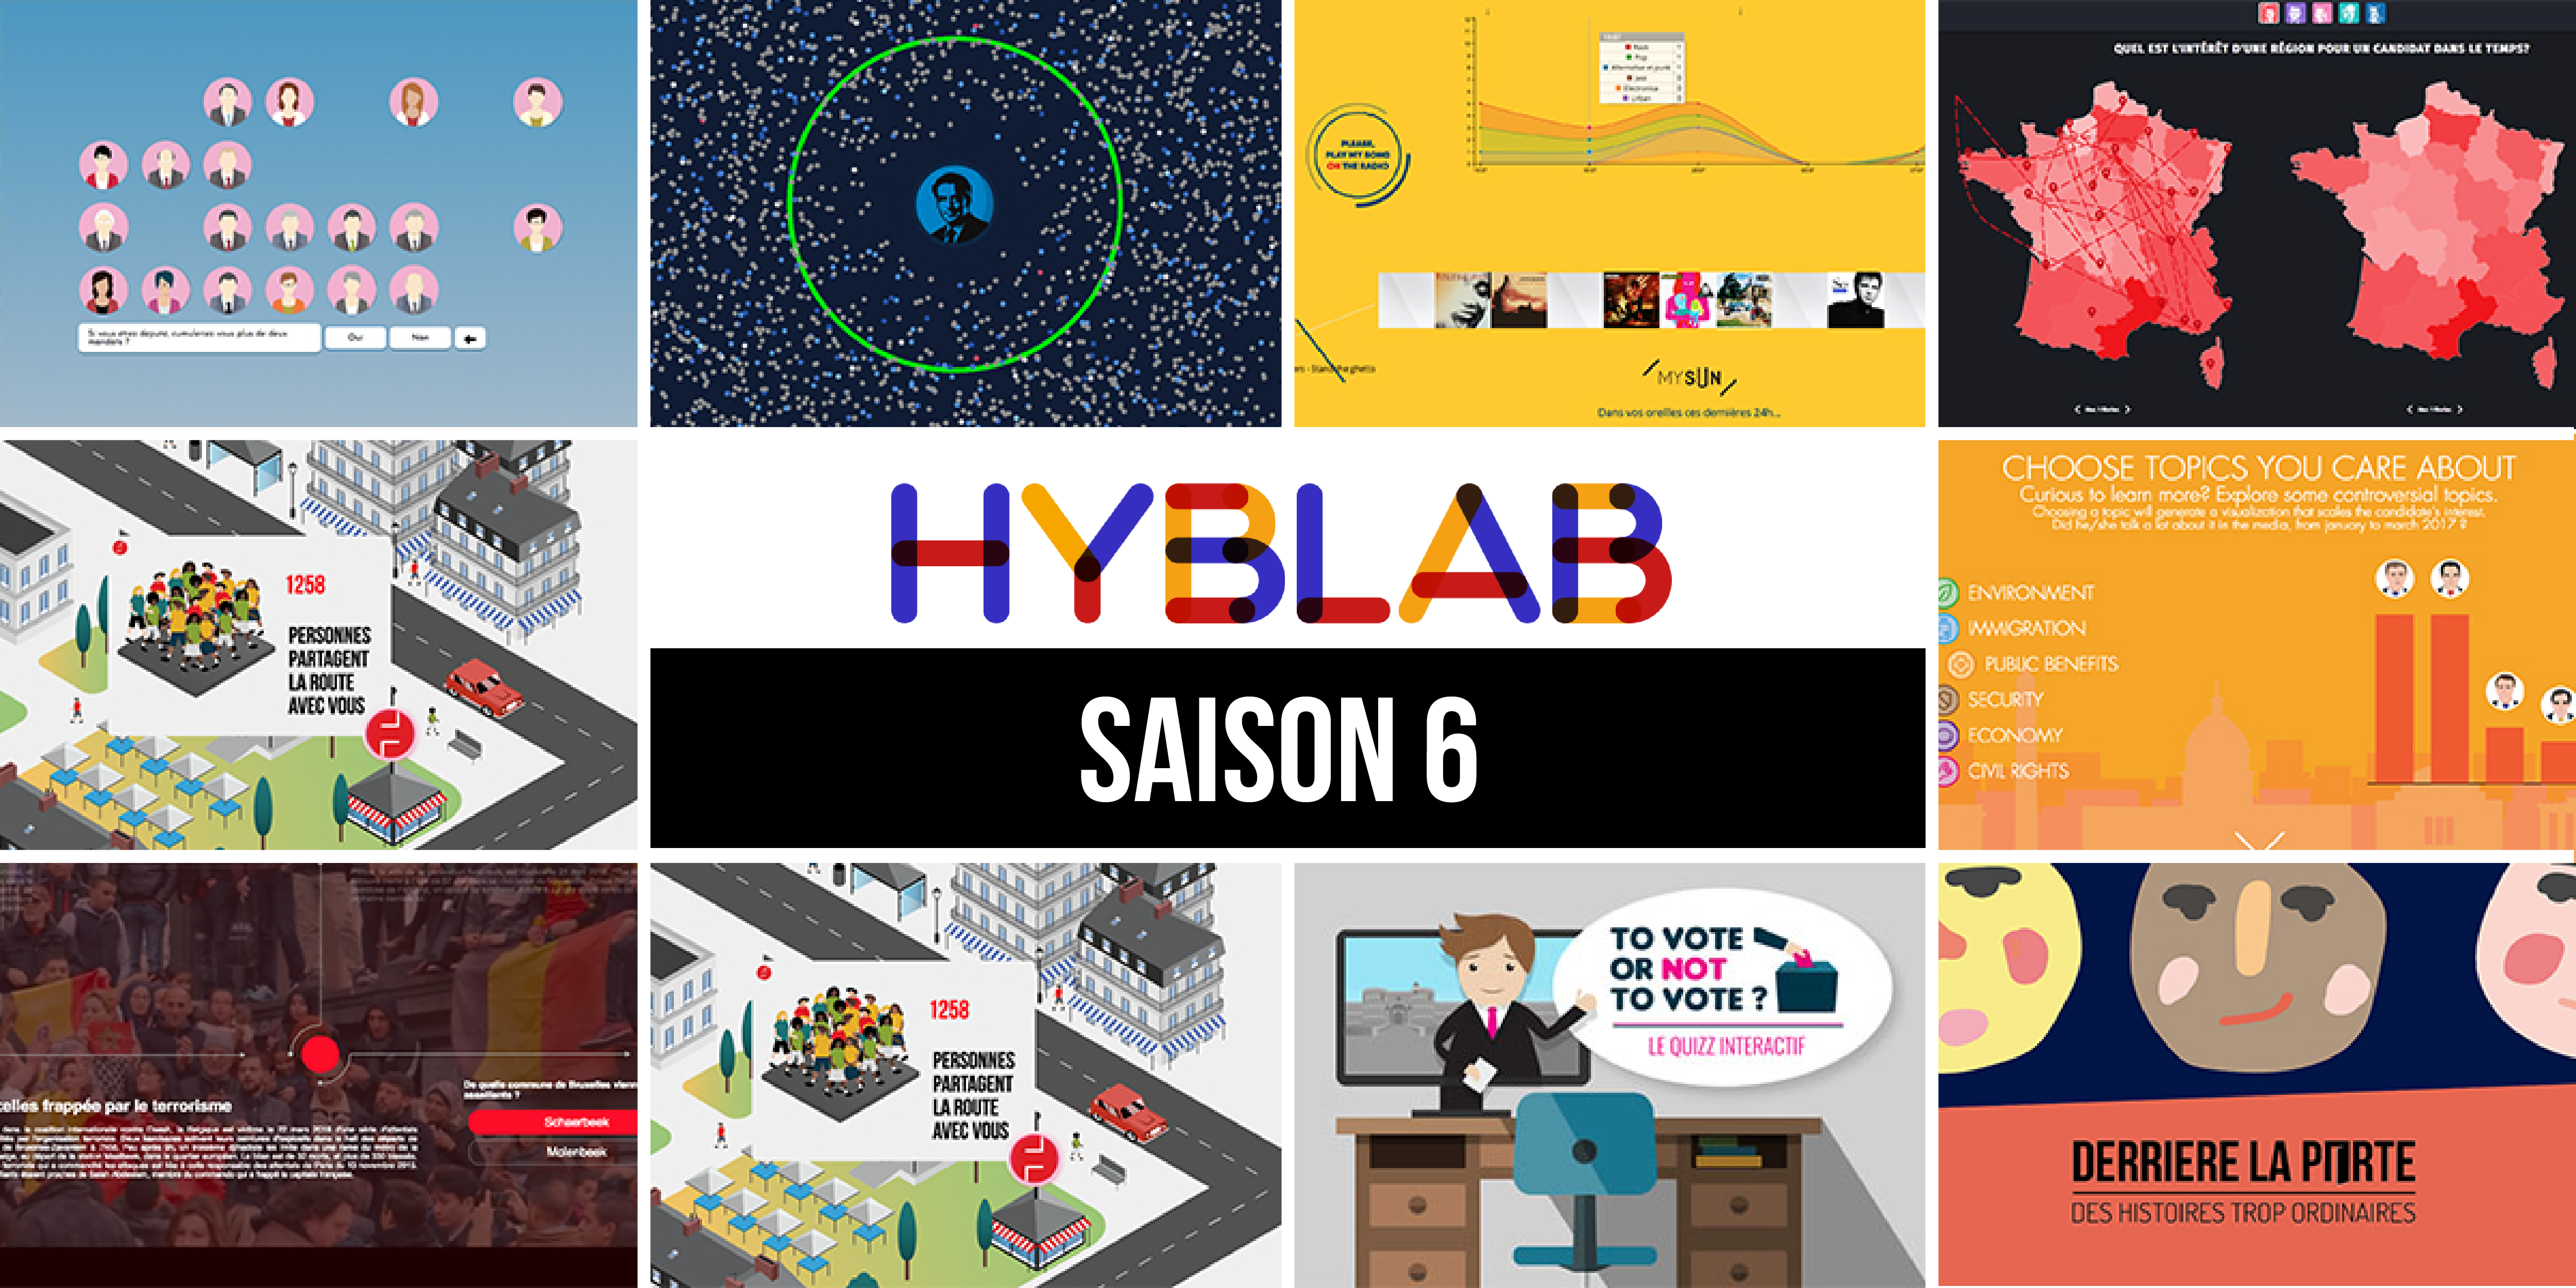 hyblab saison 6